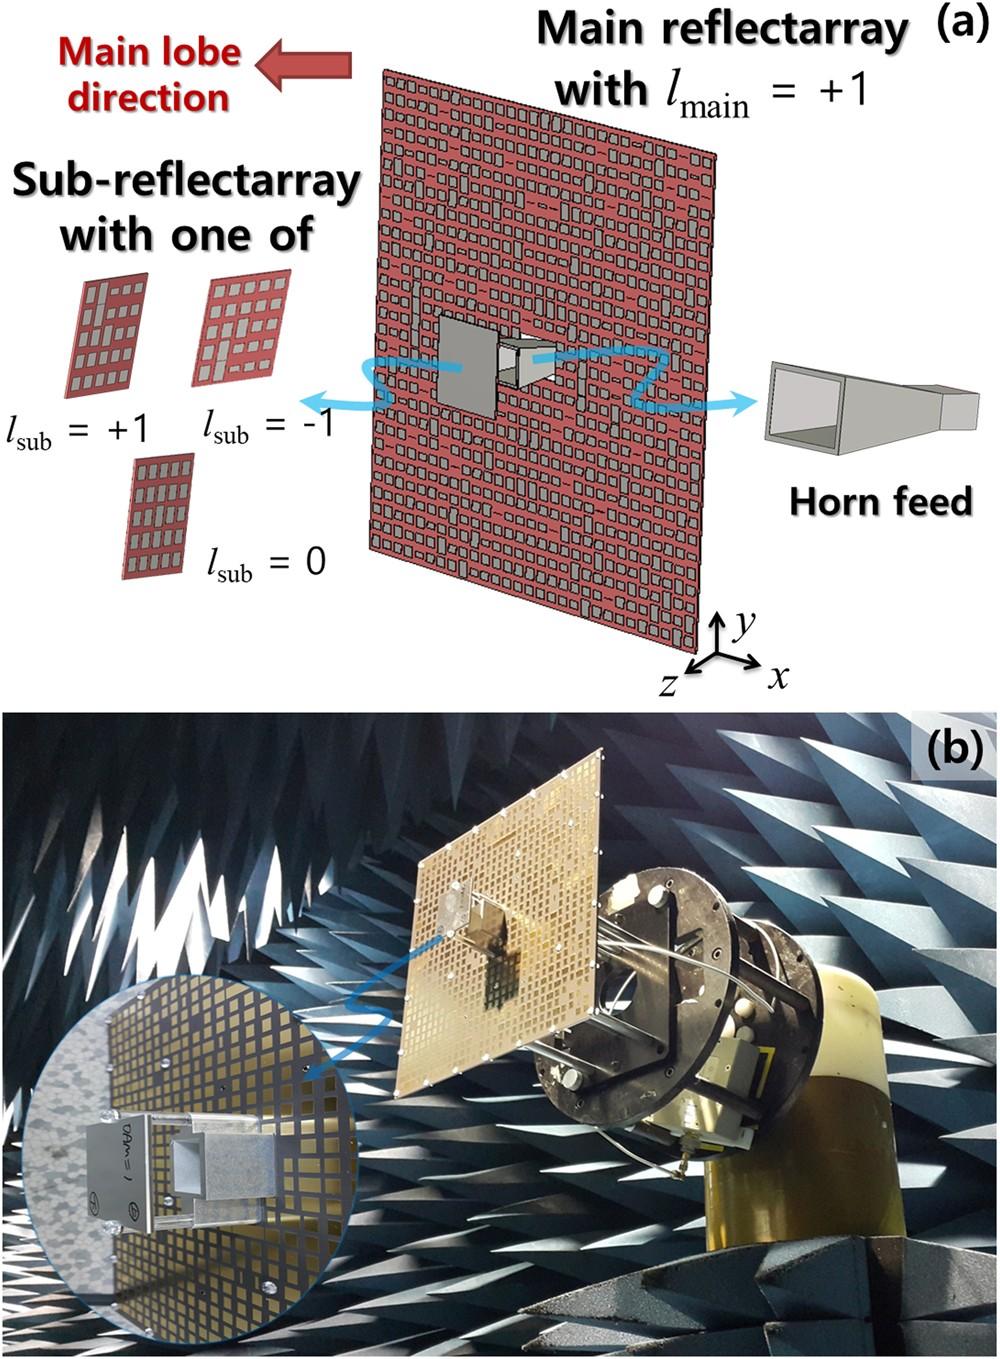 Orbital Angular Momentum (OAM) Antennas via Mode Combining